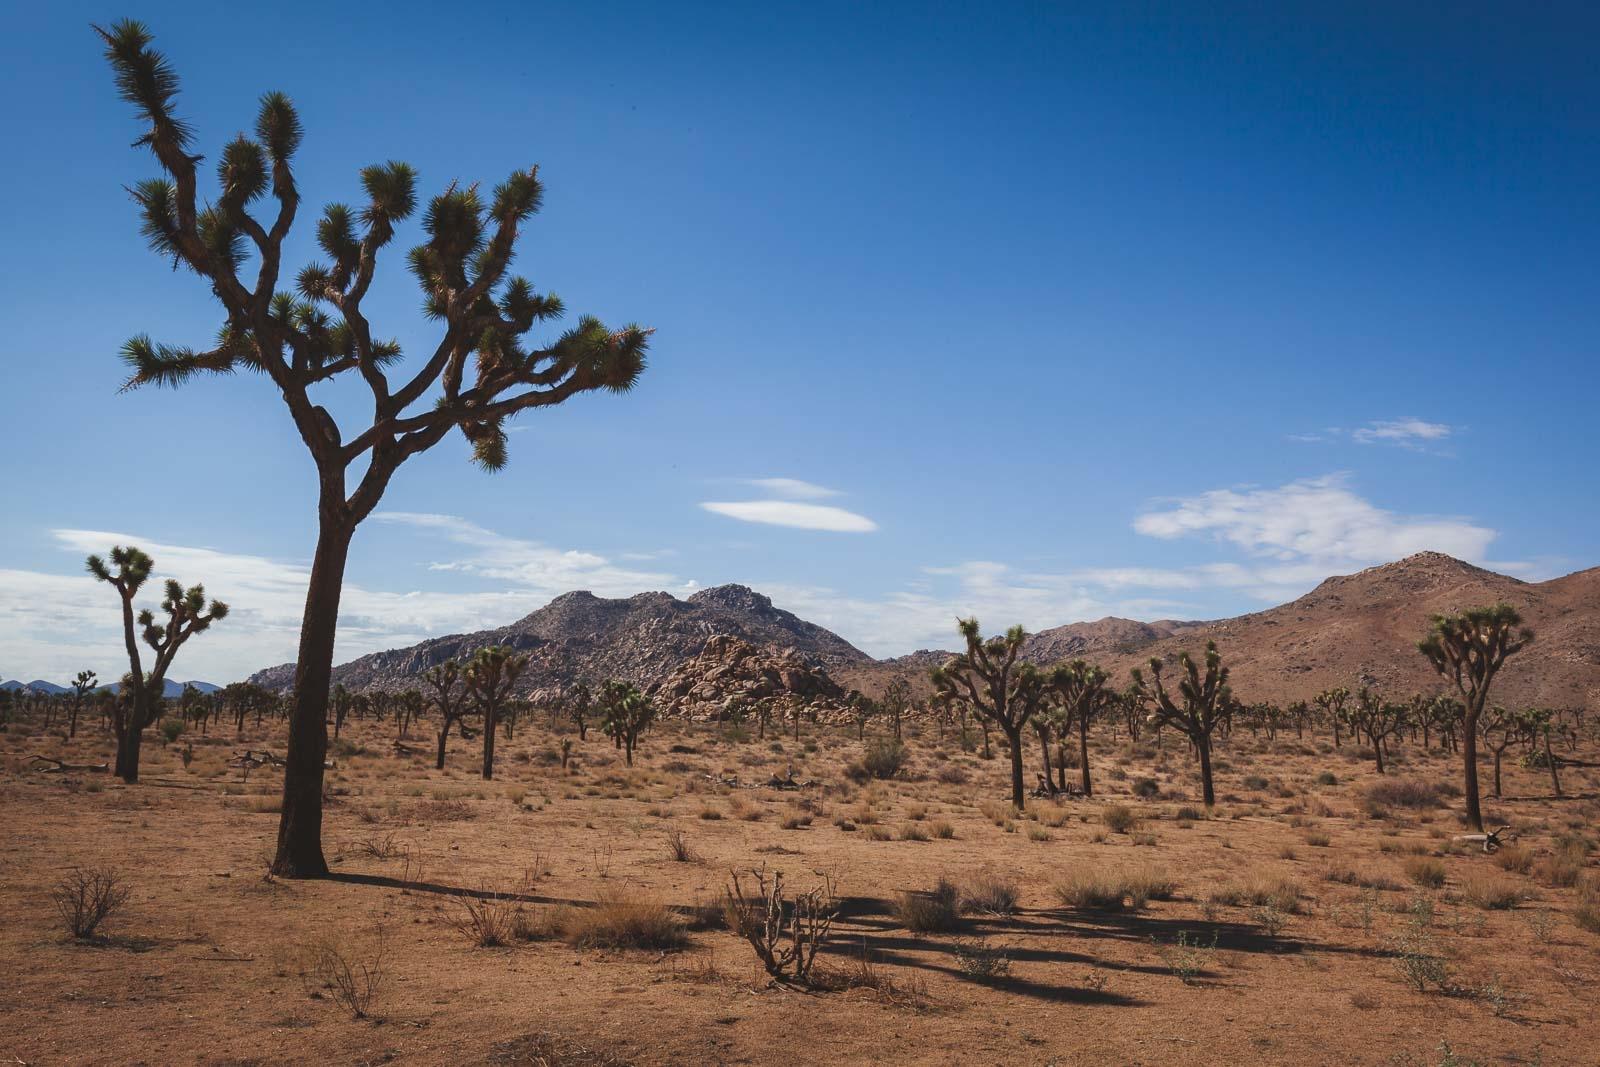 Best Hikes in Joshua Tree